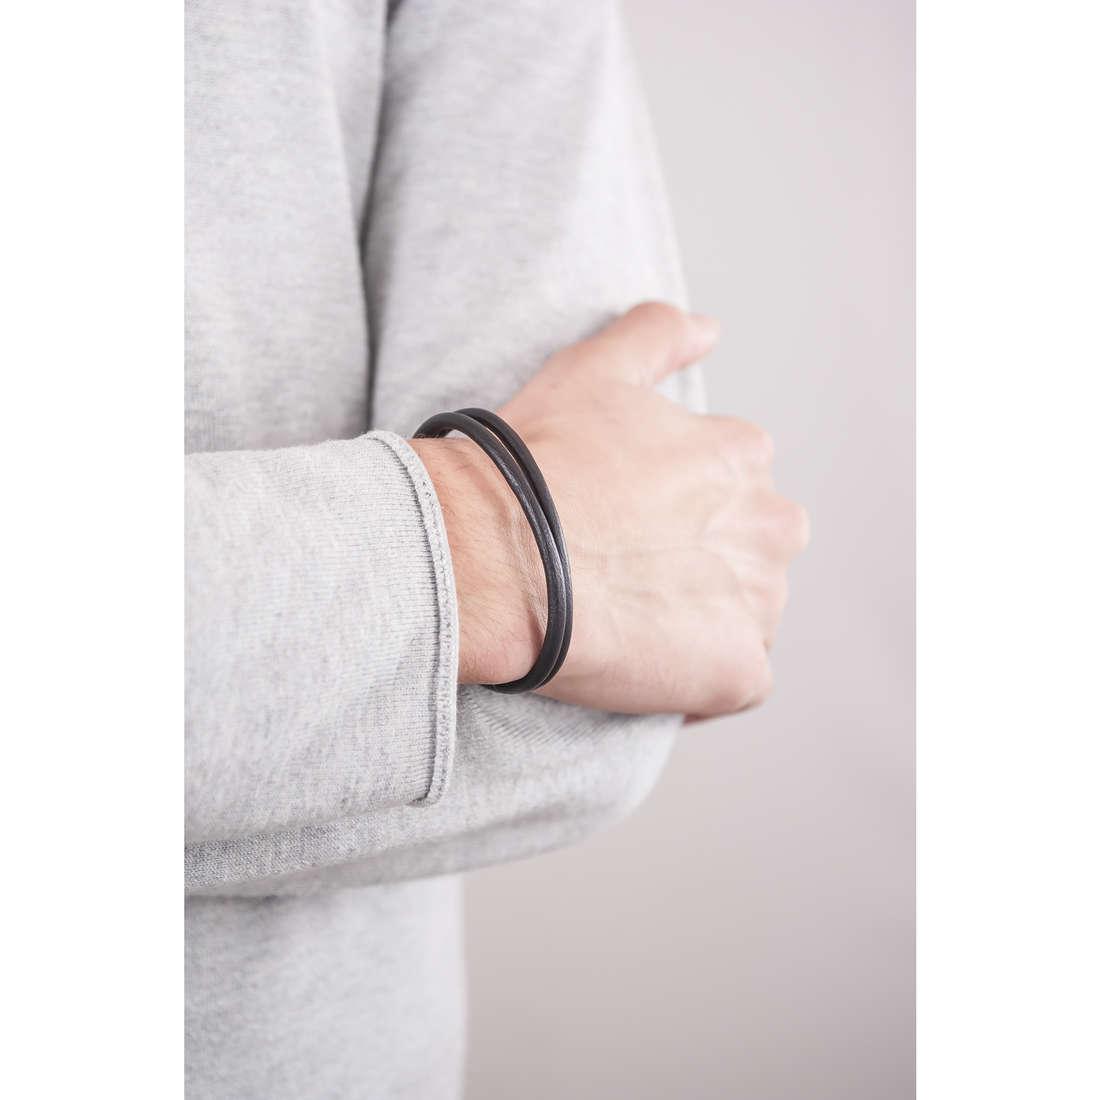 Emporio Armani bracciali uomo EGS2212040 indosso